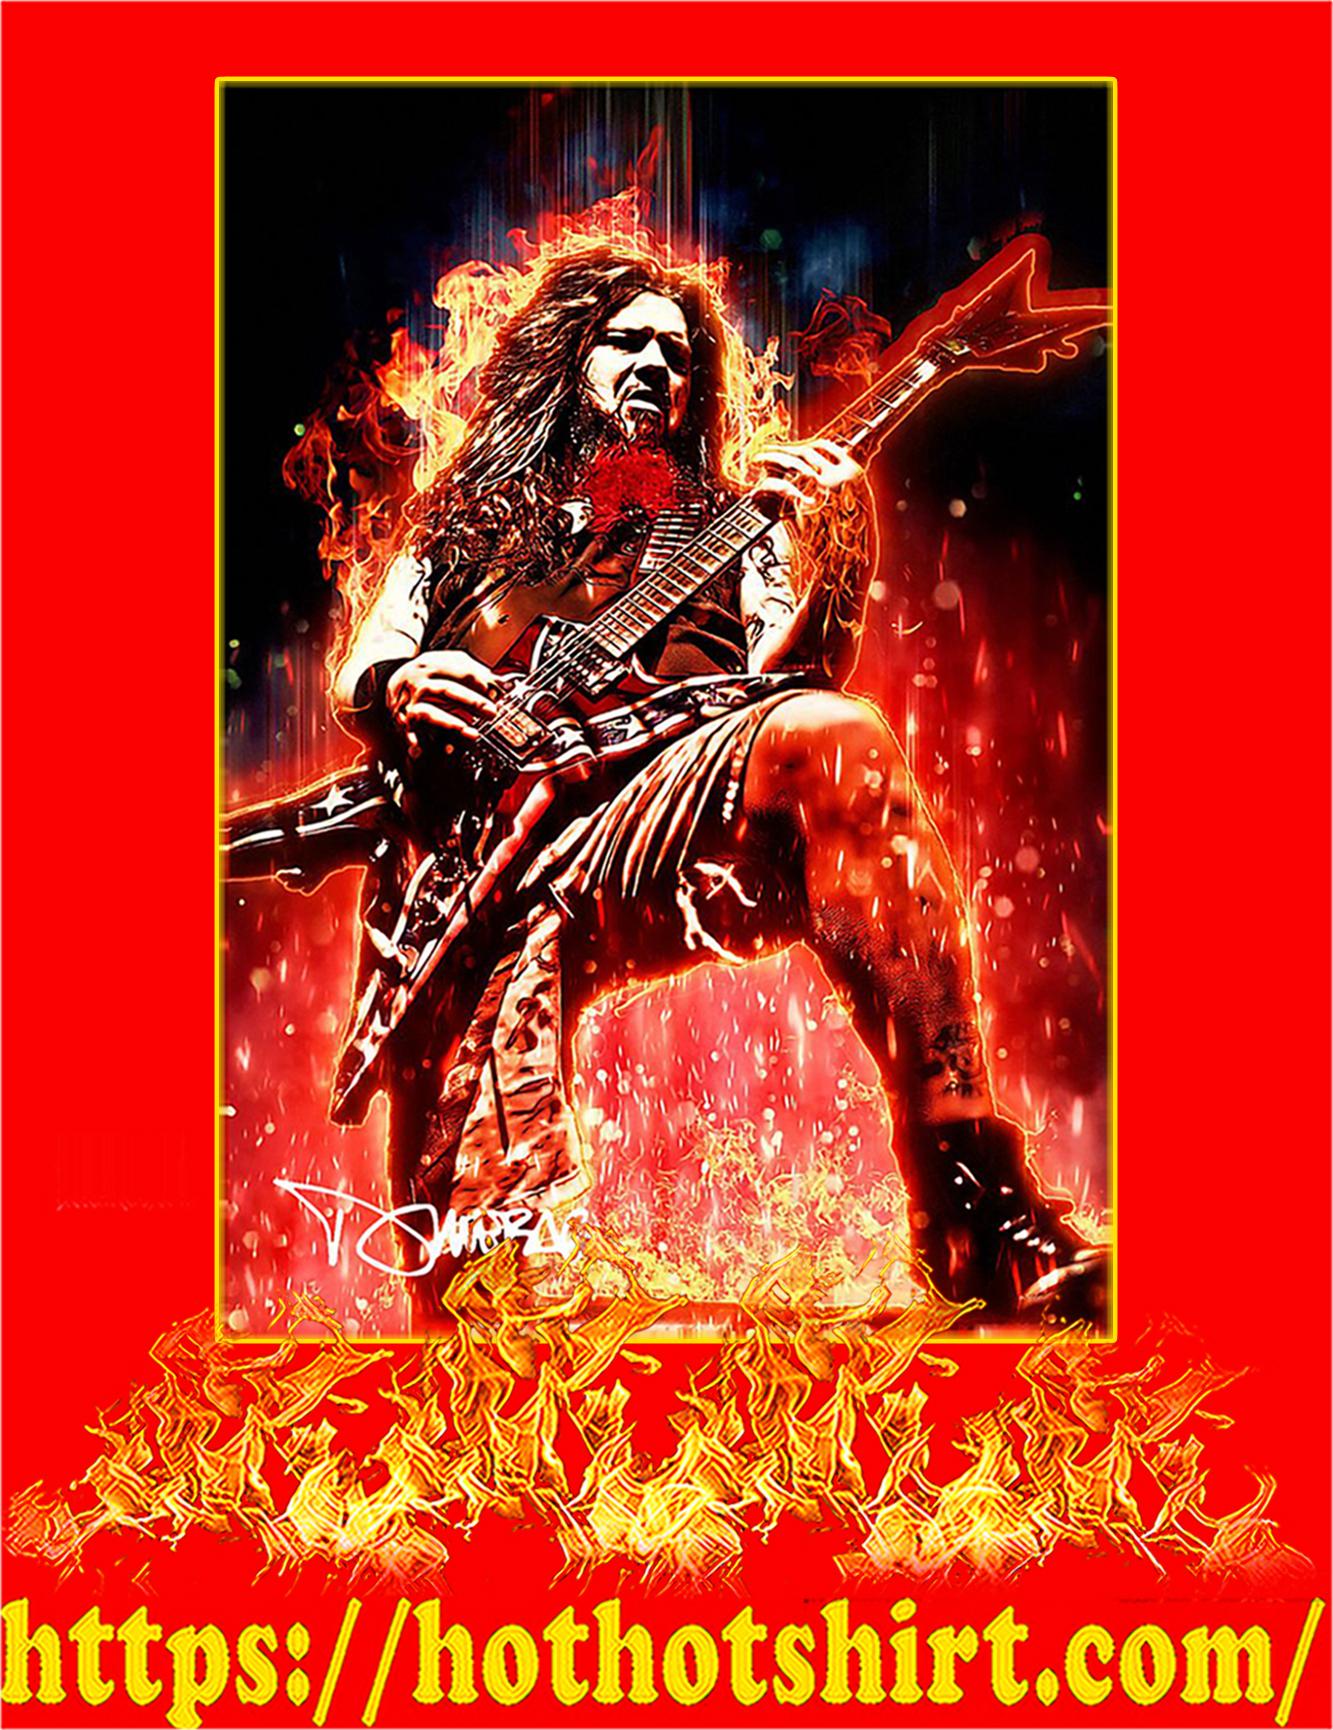 Legendary Dimebag Darrell Signature Poster - A2